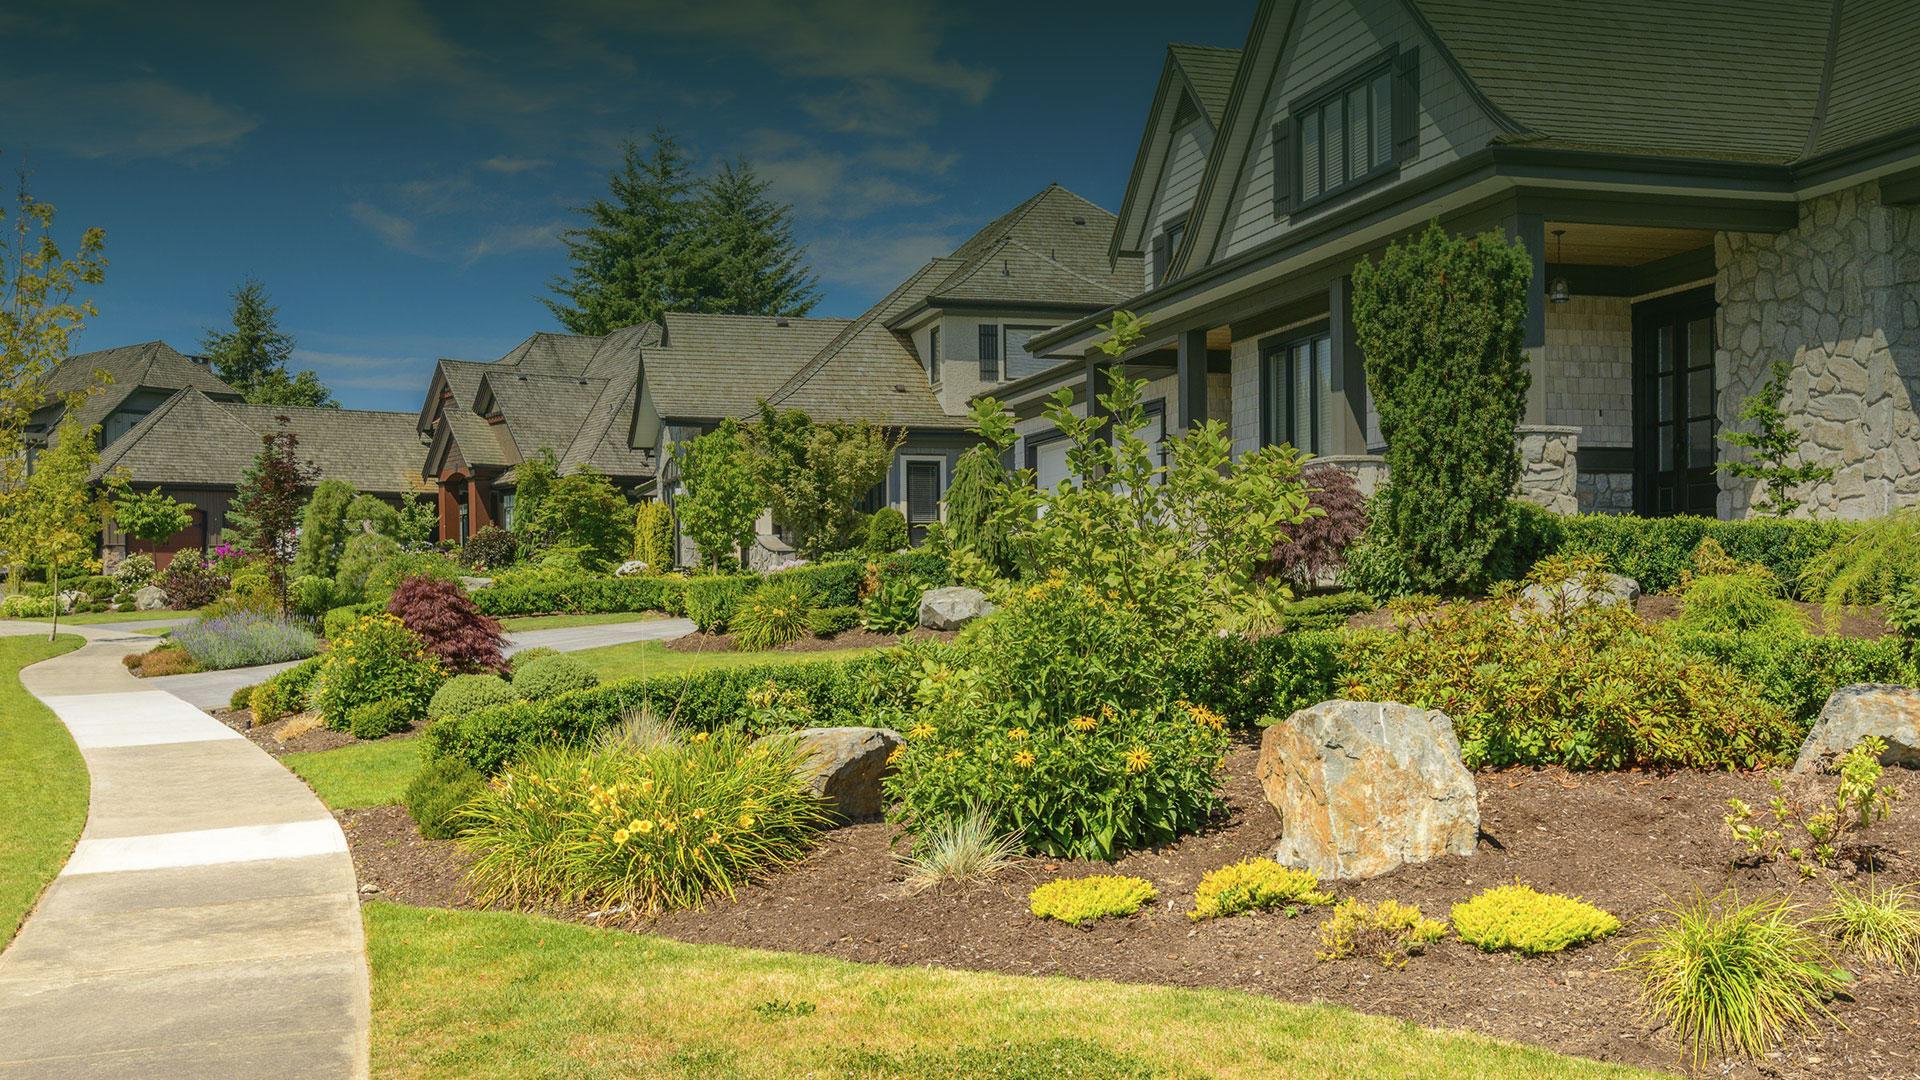 EW Lawn Care Service LLC Lawn Maintenance, Garden Design and Fertilization slide 3